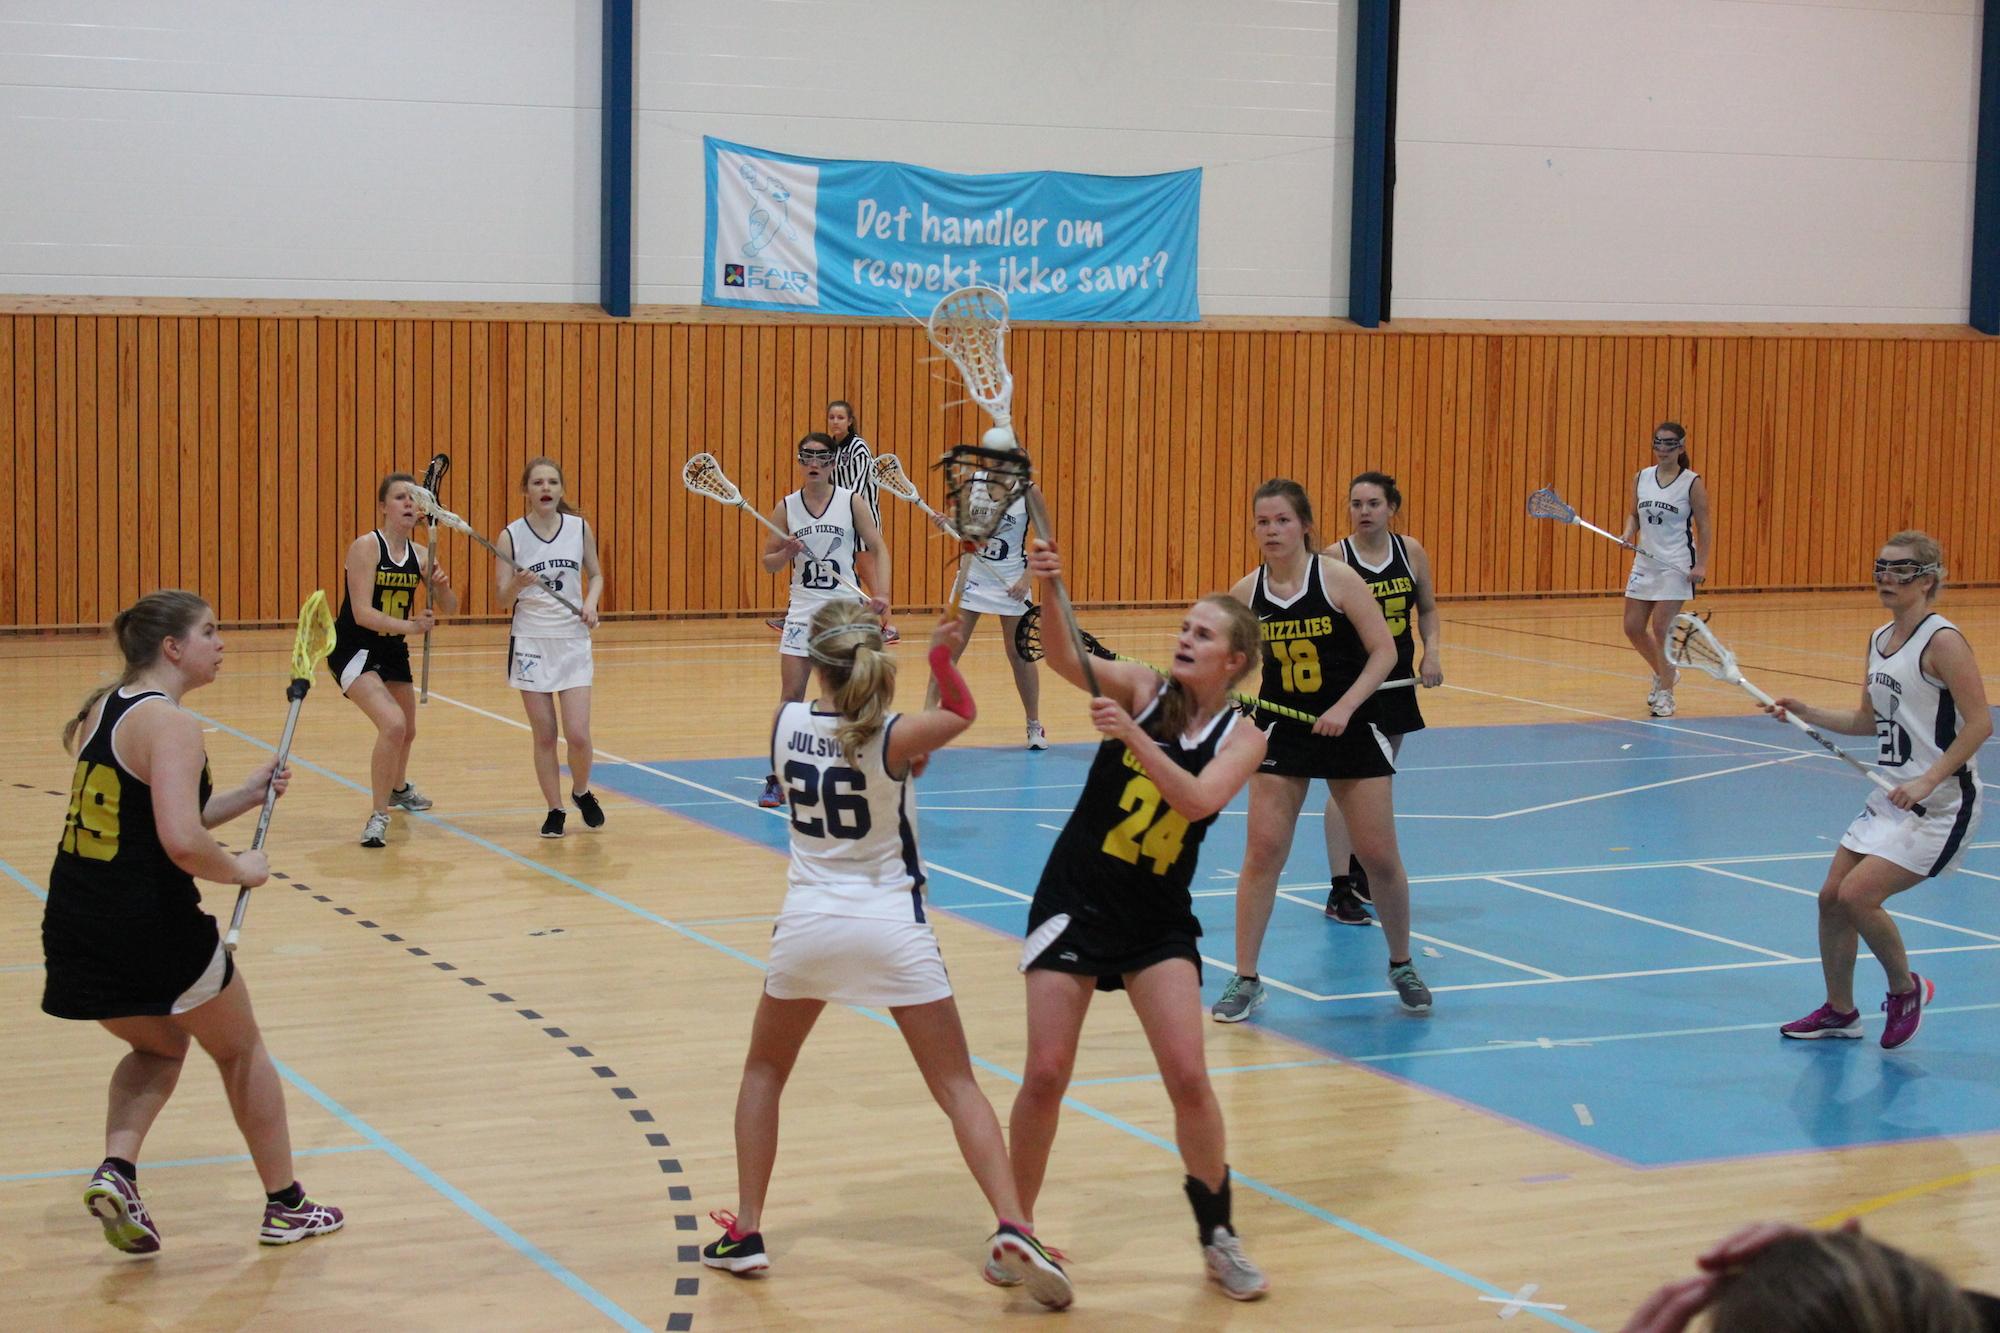 Lacrosse-fest i Grimstad